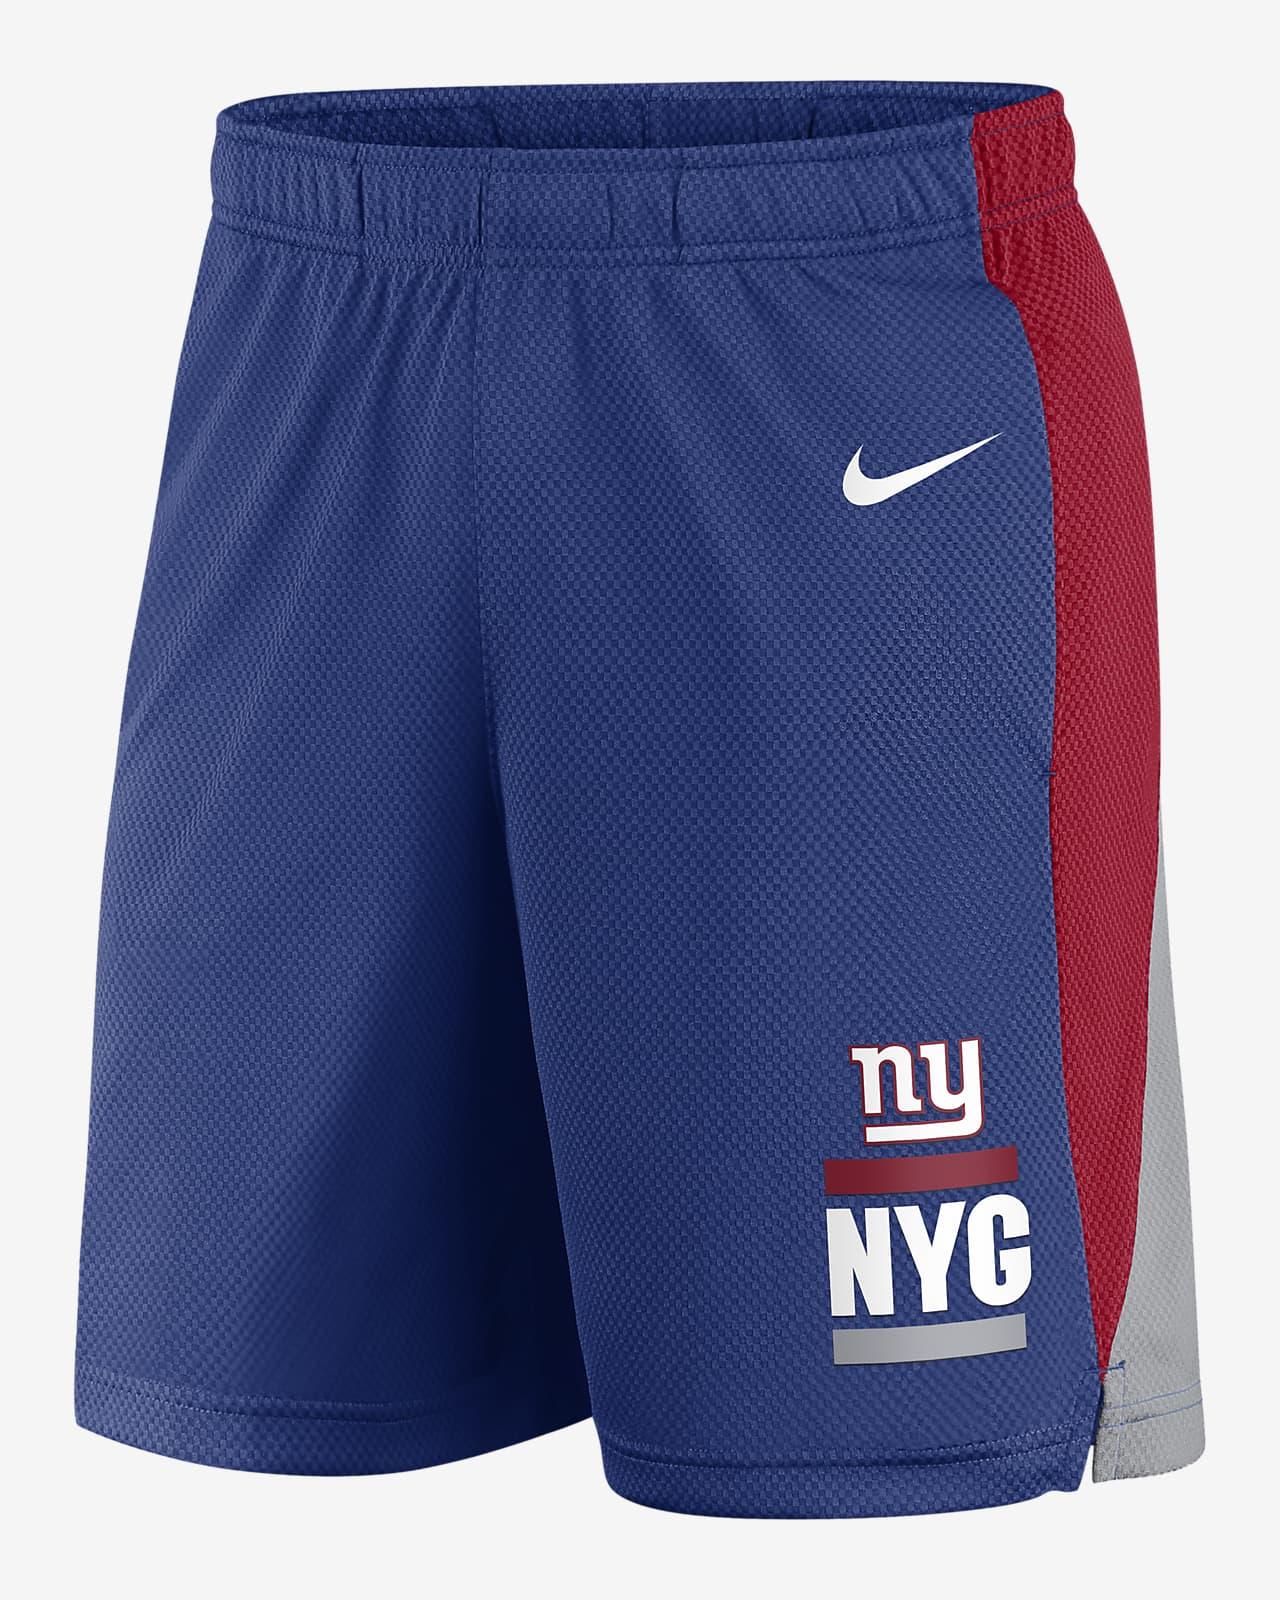 Nike Dri-FIT Broadcast (NFL New York Giants) Men's Shorts